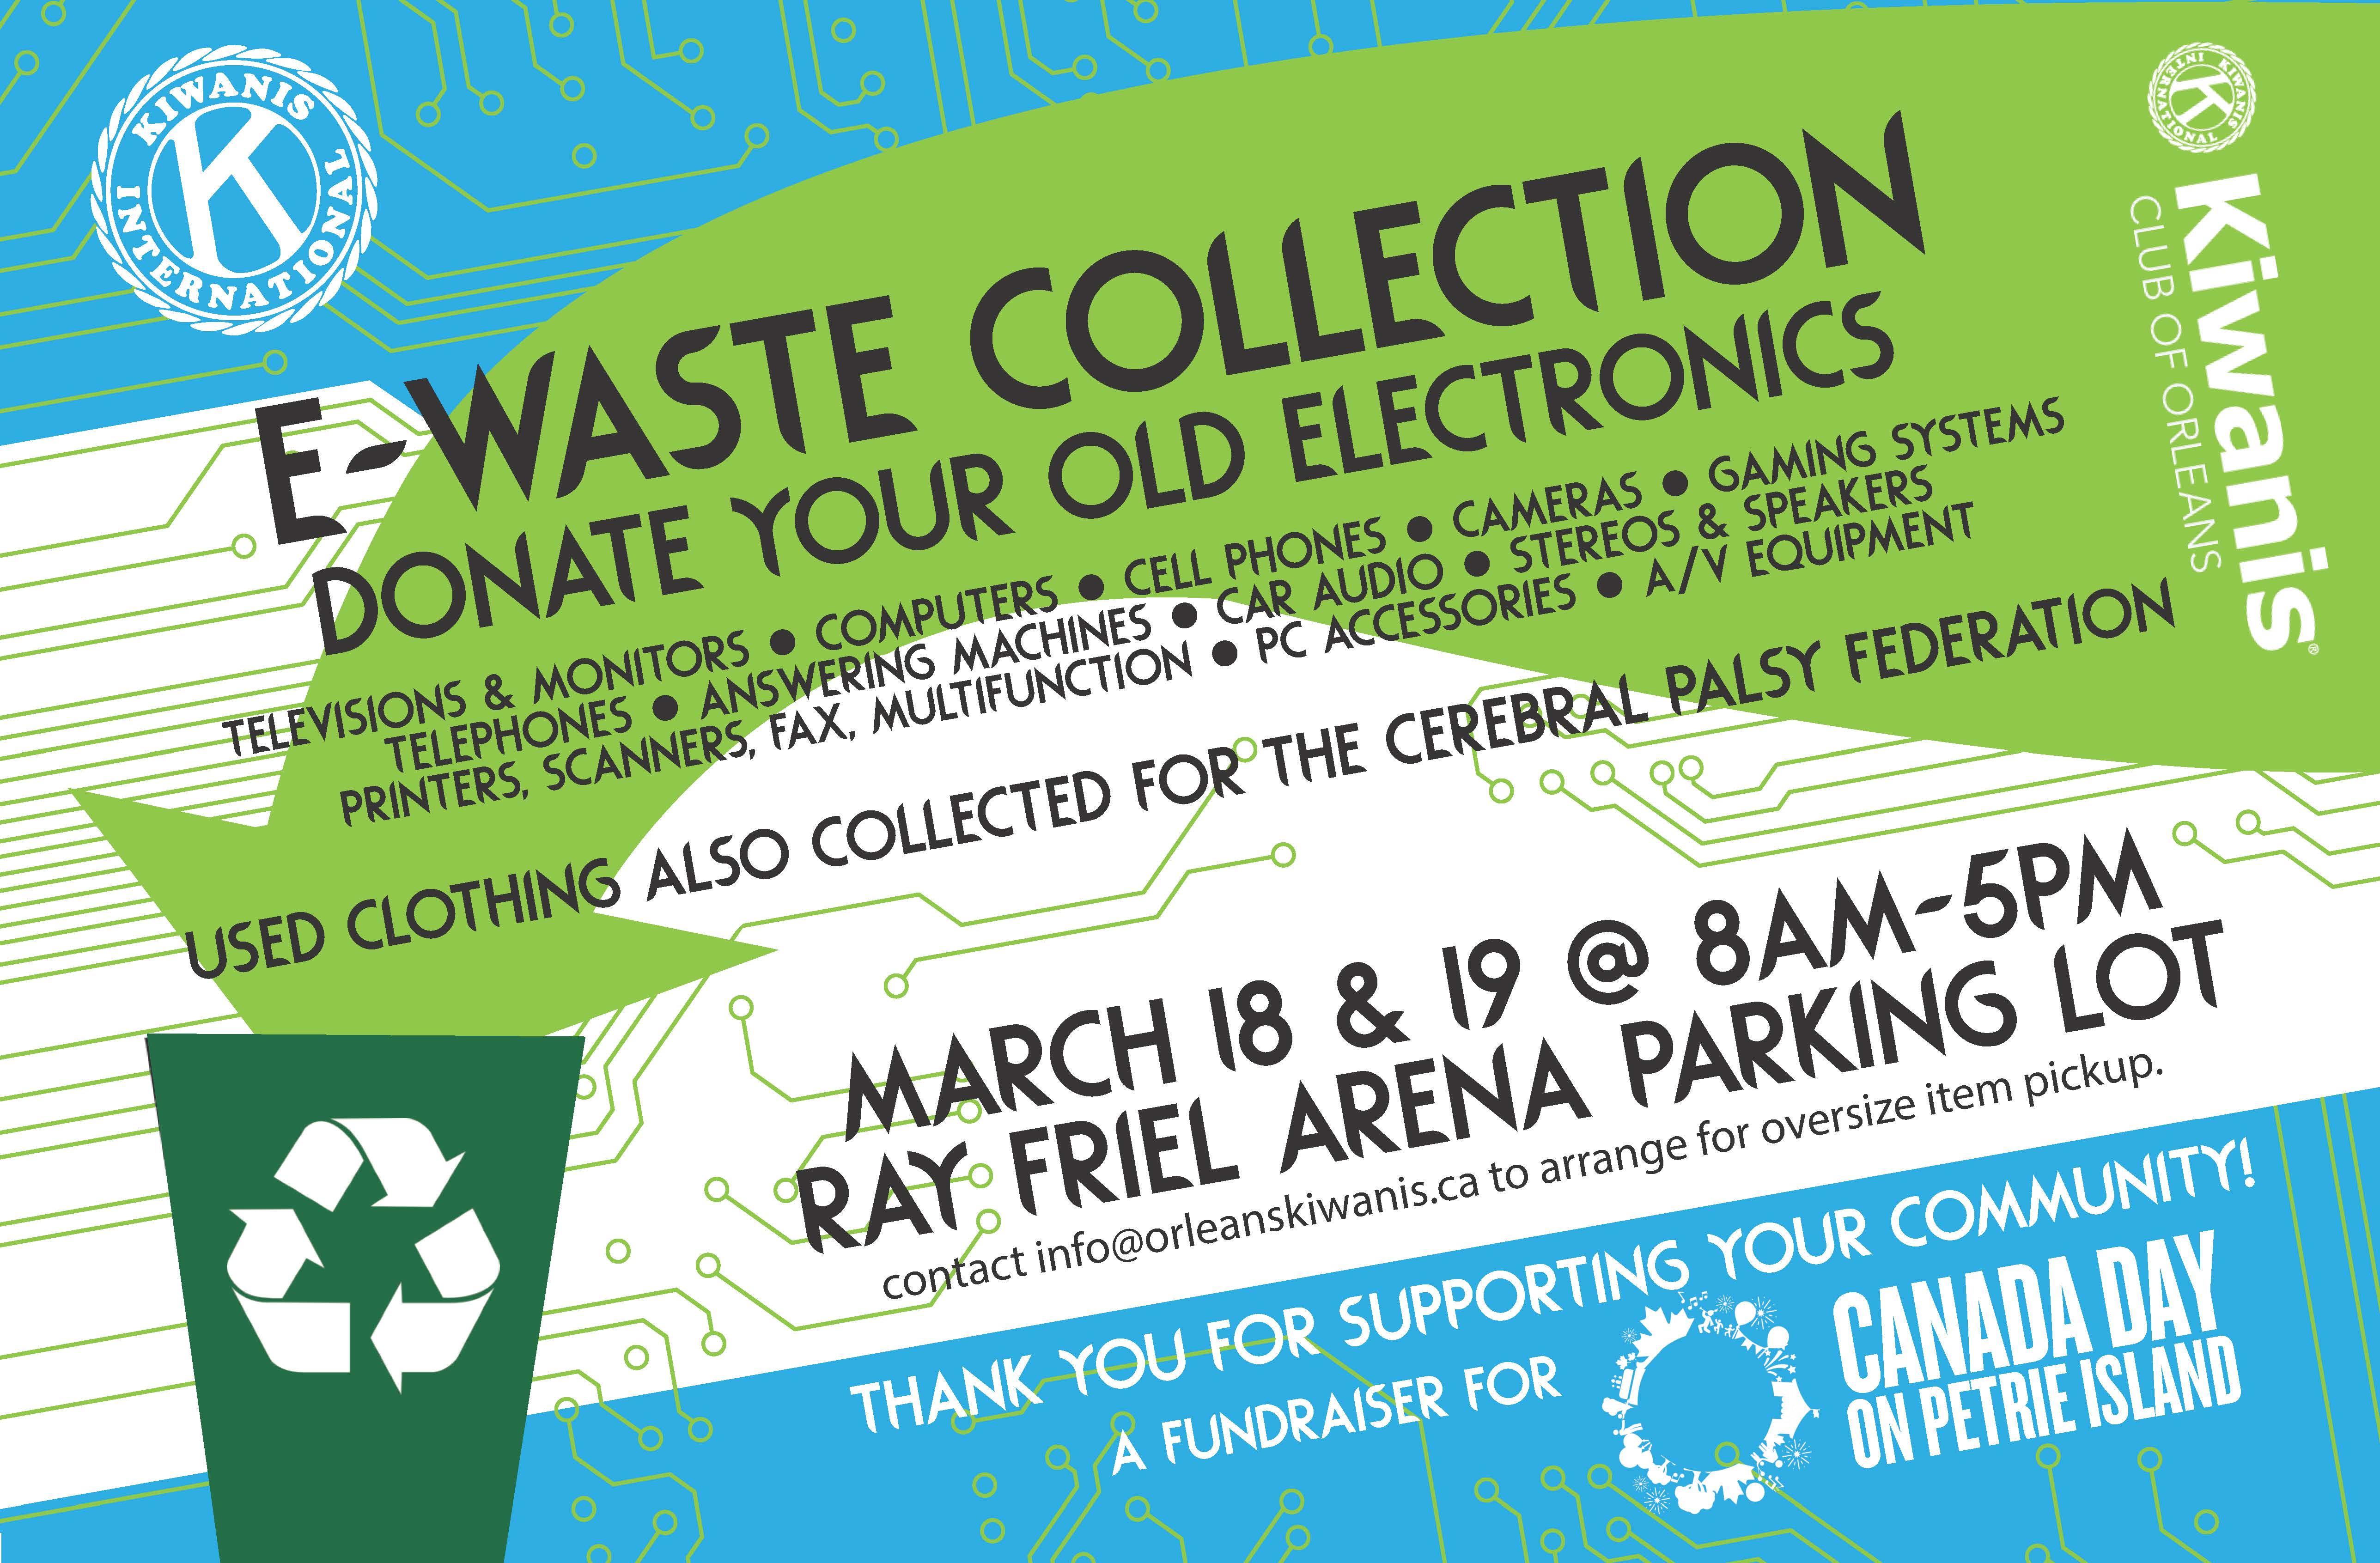 ewaste collection flyer